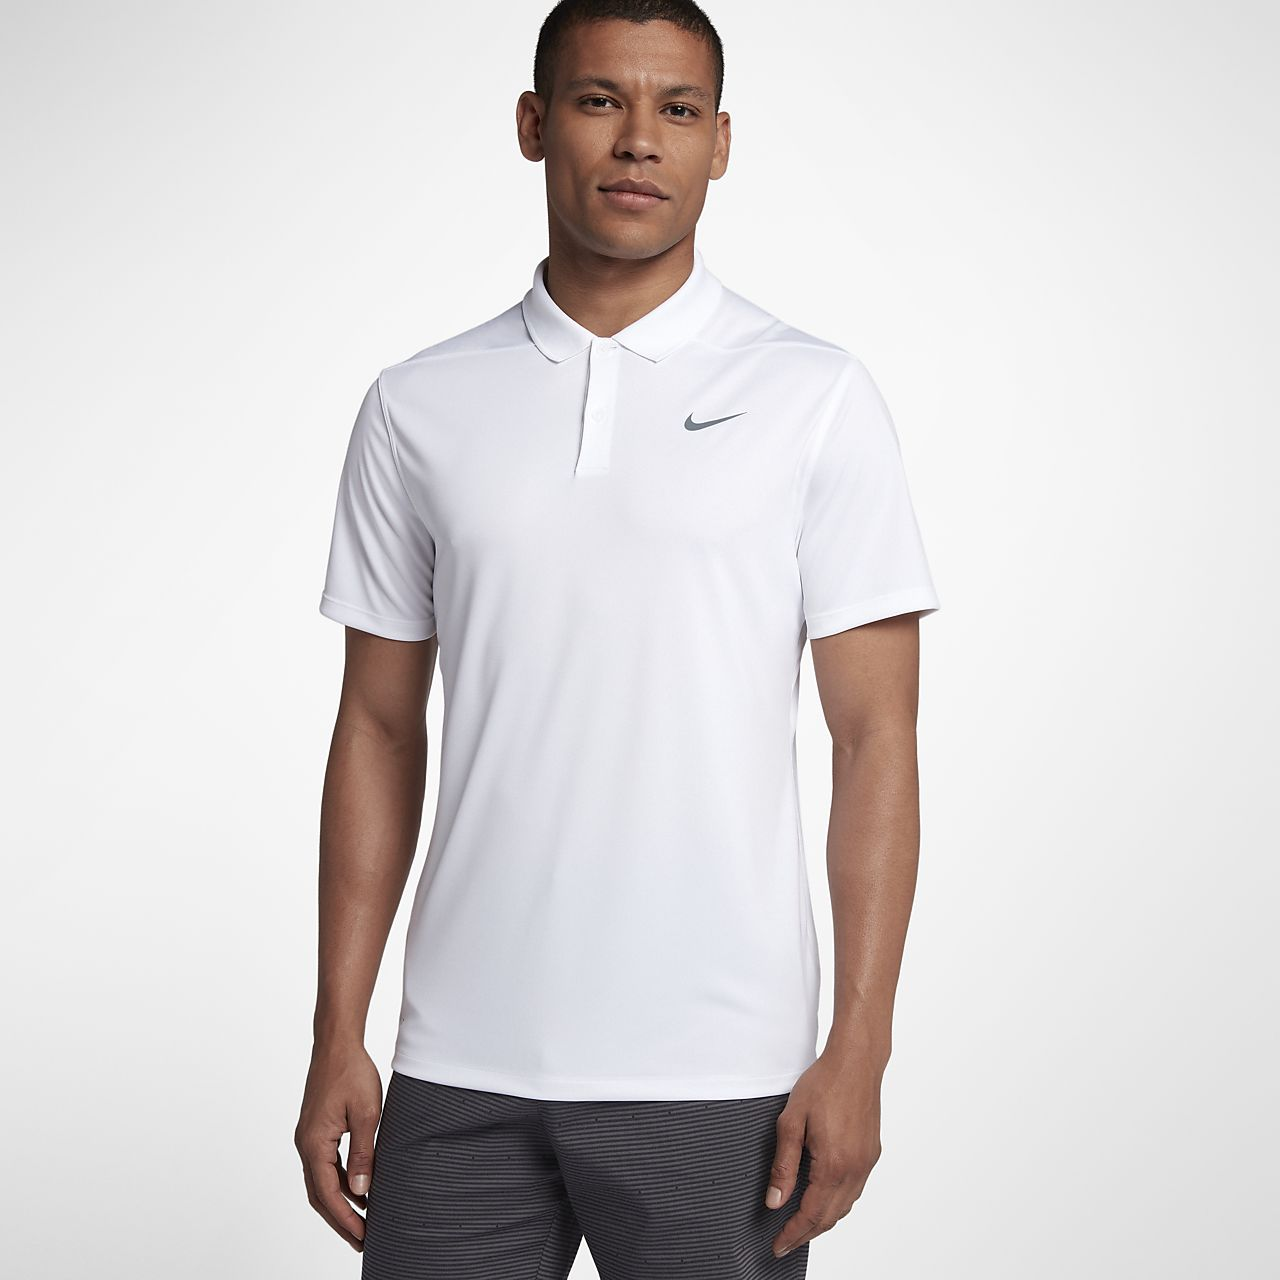 Nike Dri-FIT Victory Men's Slim-Fit Golf Polo